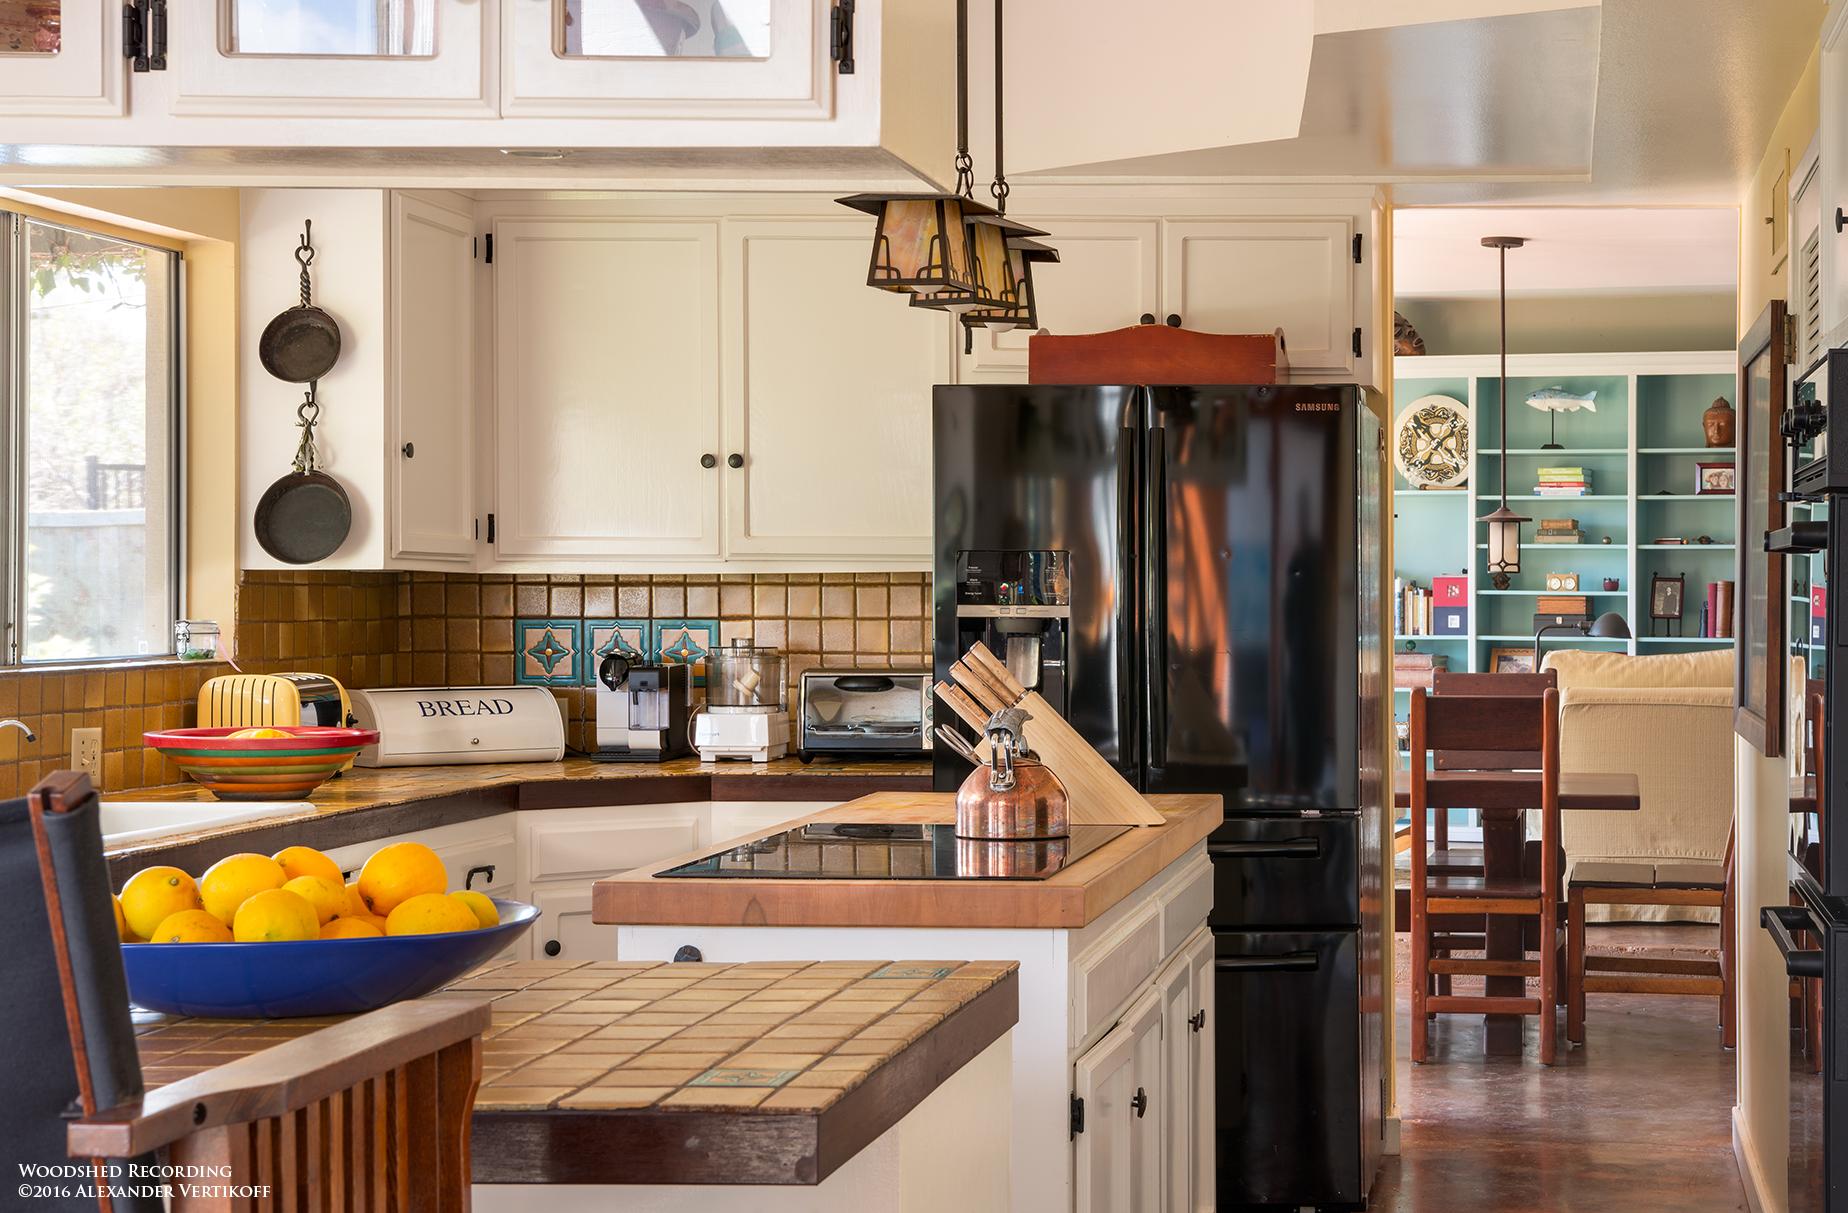 studio-malibu-woodshed-recording-studio-best-recording-studio-malibu-kitchen.jpg